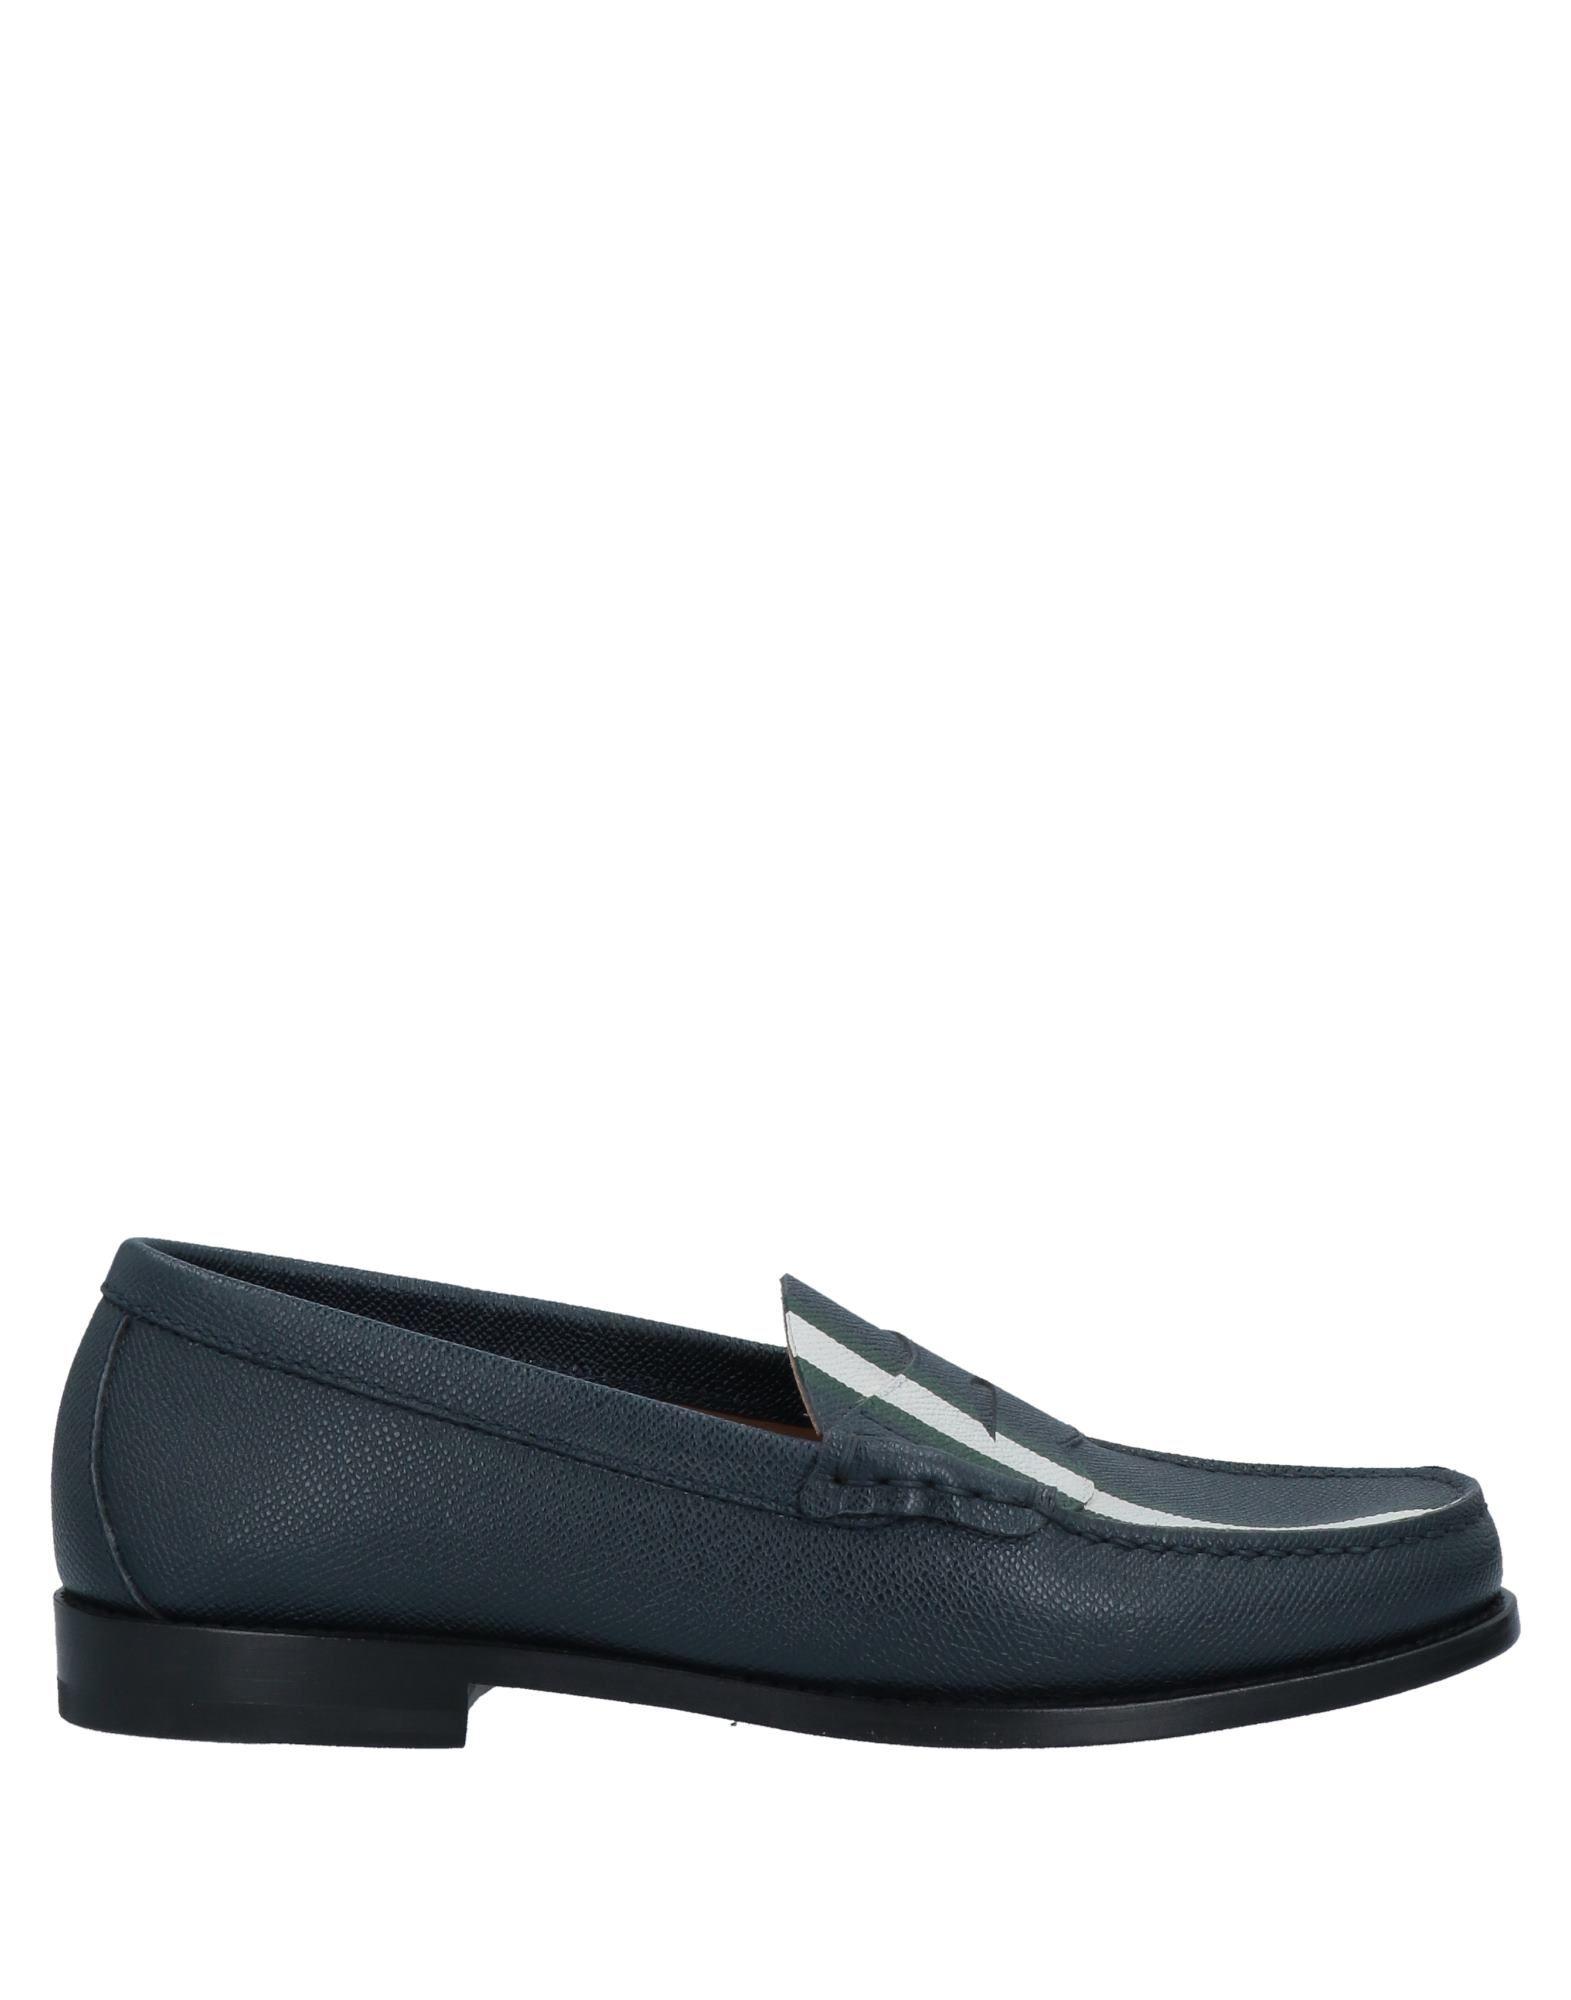 Henderson Baracco Loafers In Dark Blue